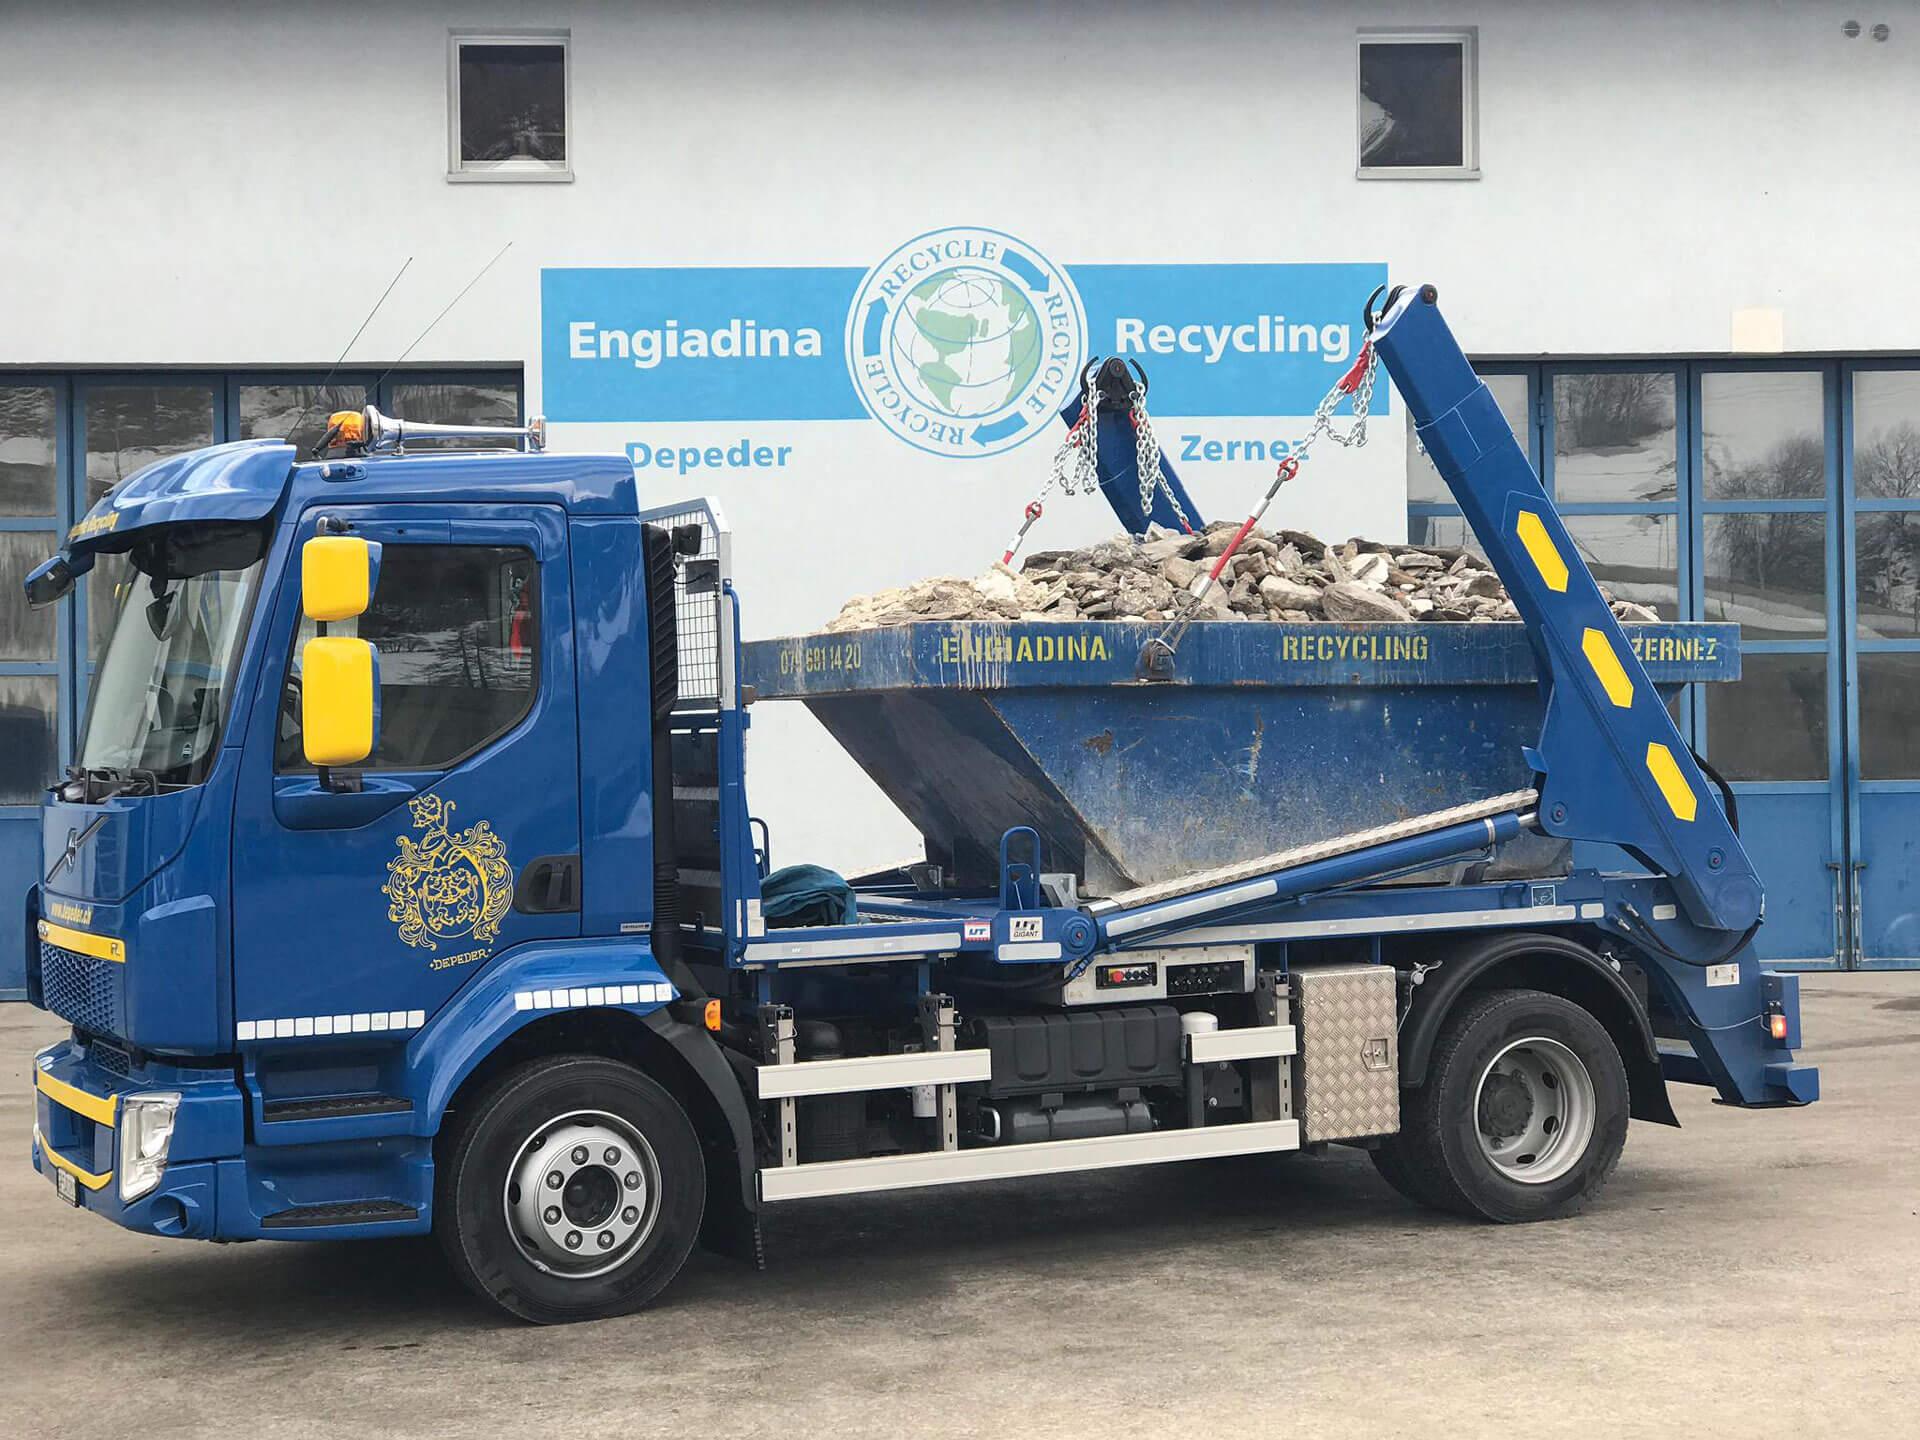 Welaki: Realisierter Absetzkipper Gigant12T der Engiadina Recycling AG